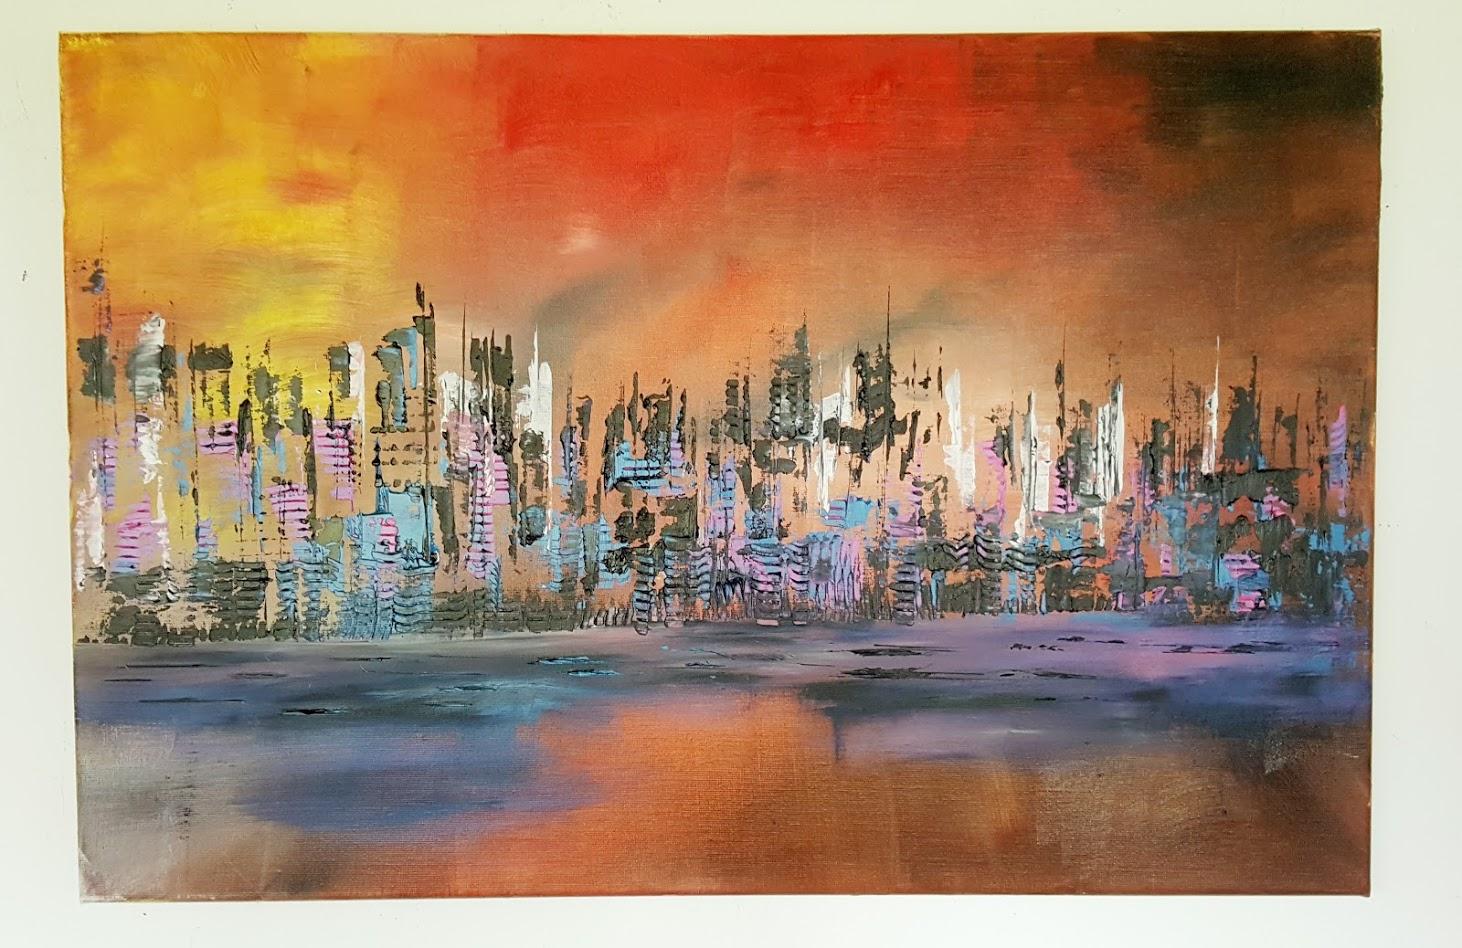 tableau de gauchepatte intitulé urban oil